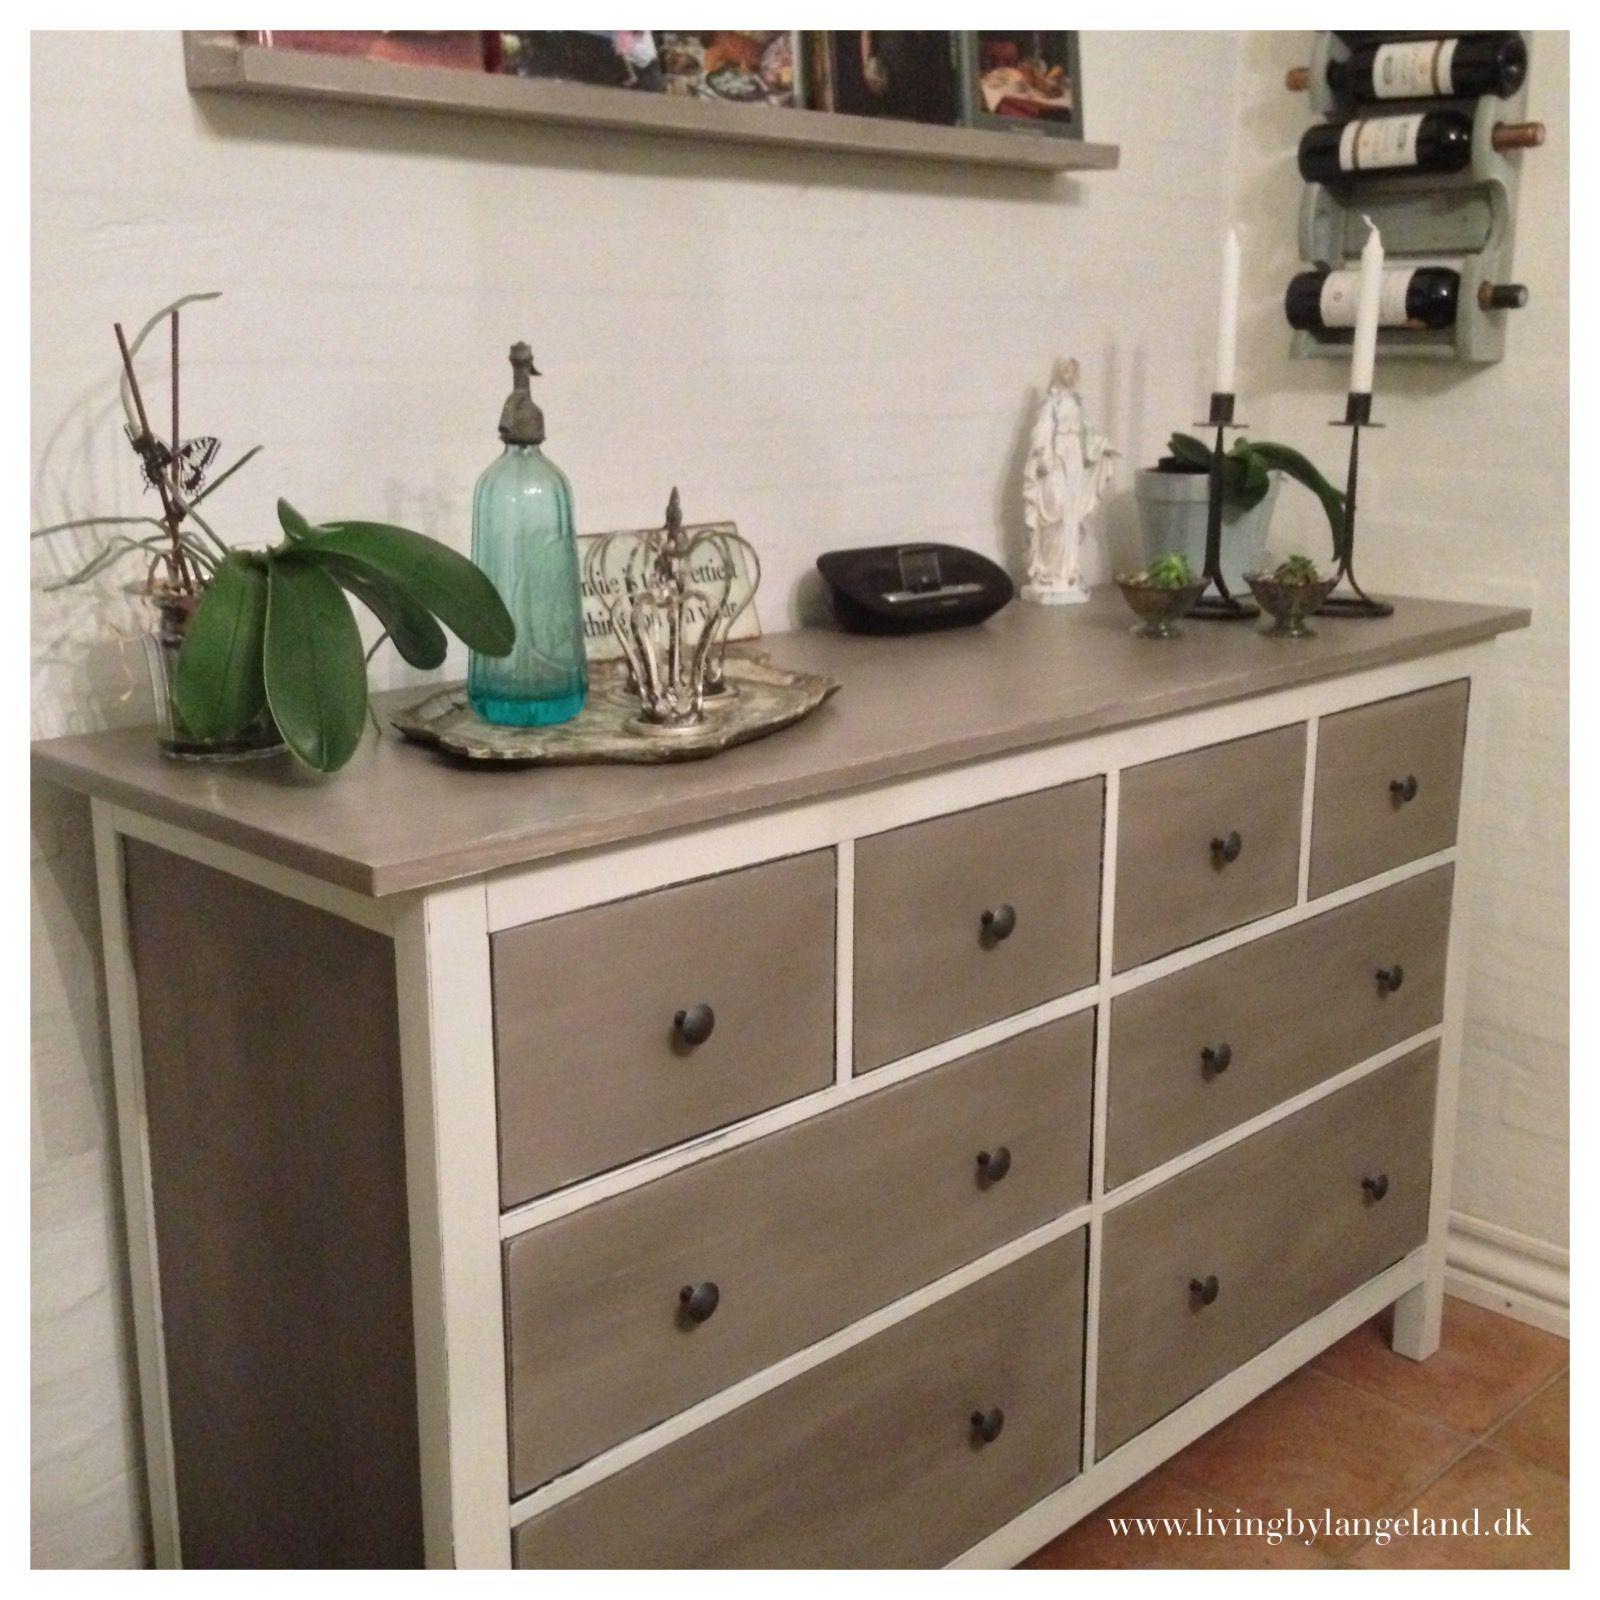 Chalk Paint Kitchen Cabinets Green: Annie Sloan Chalk Paint French Linen